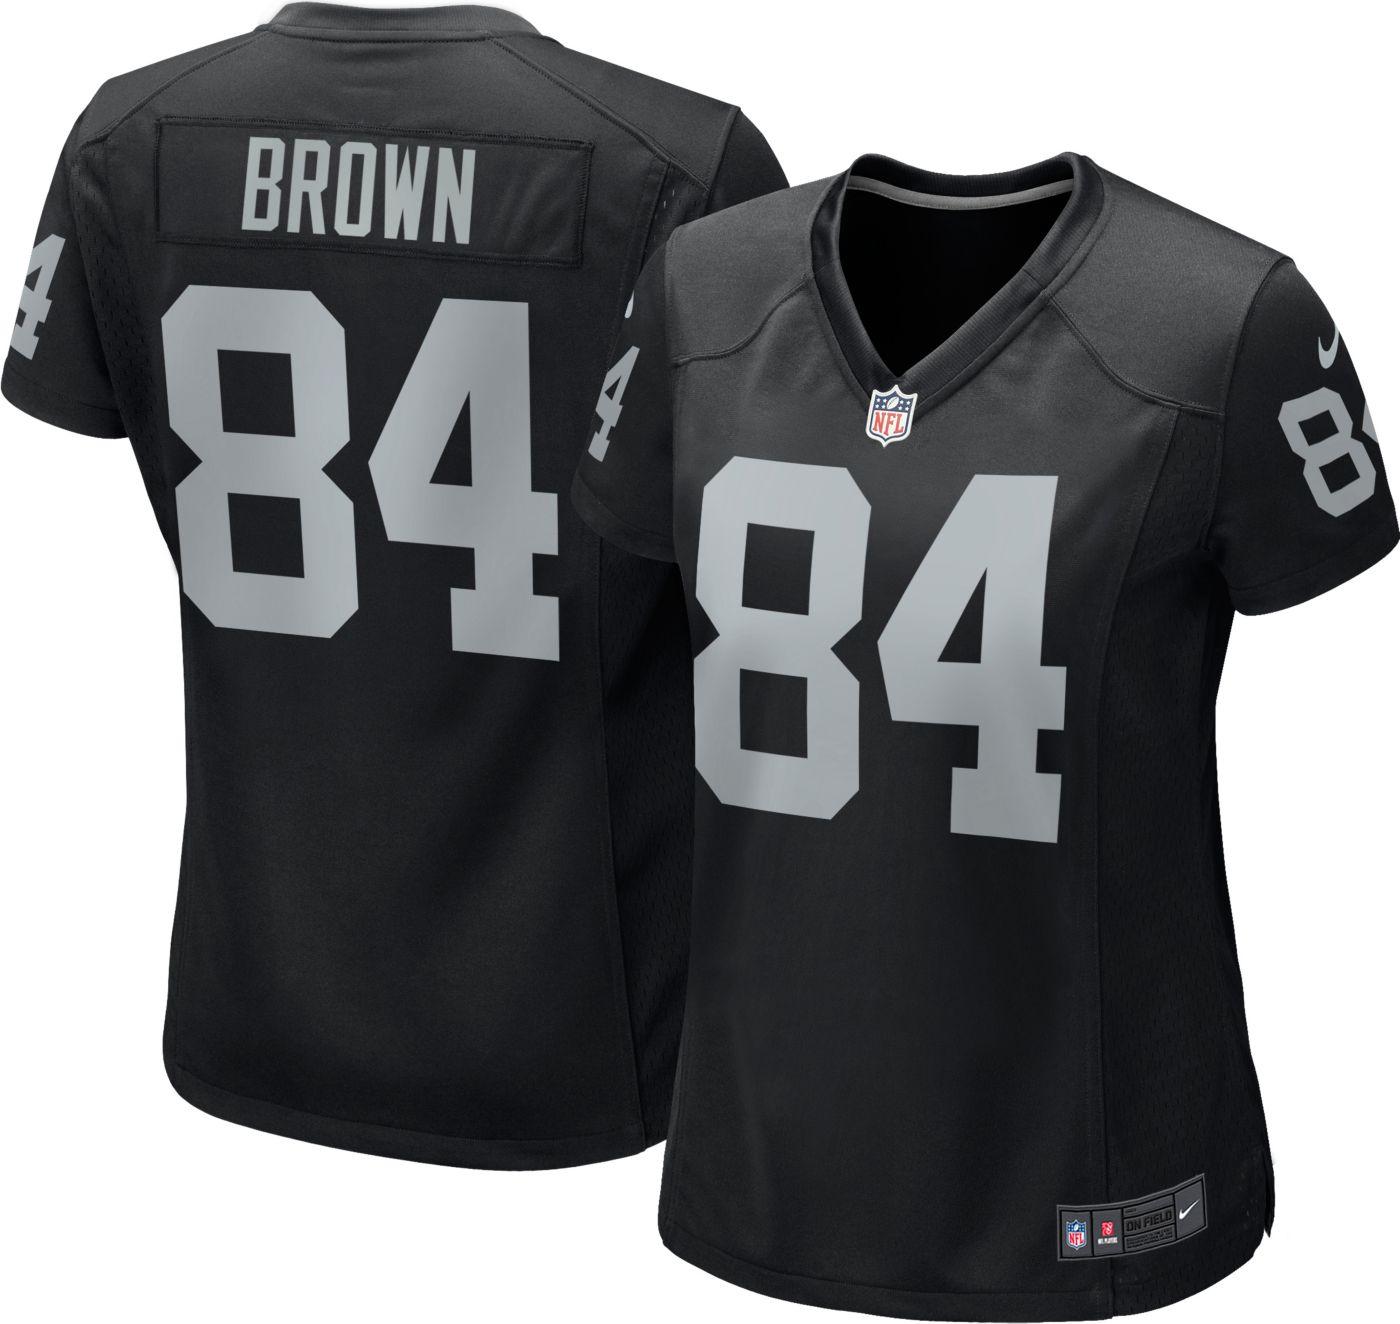 Antonio Brown #84 Nike Women's Oakland Raiders Home Game Jersey